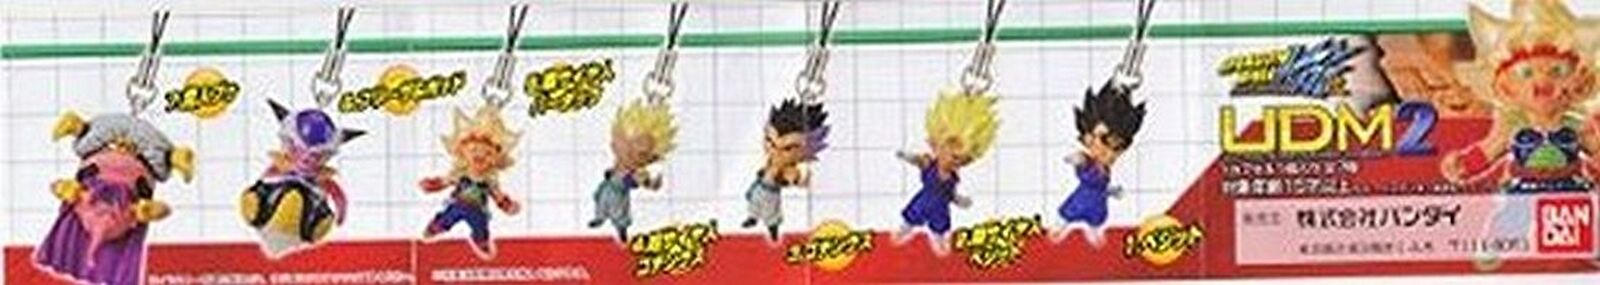 Bandai Dragon Ball Z Kai UDM2 Ultimate Deformed Mascot Phone Charm-2 SS Gotenks